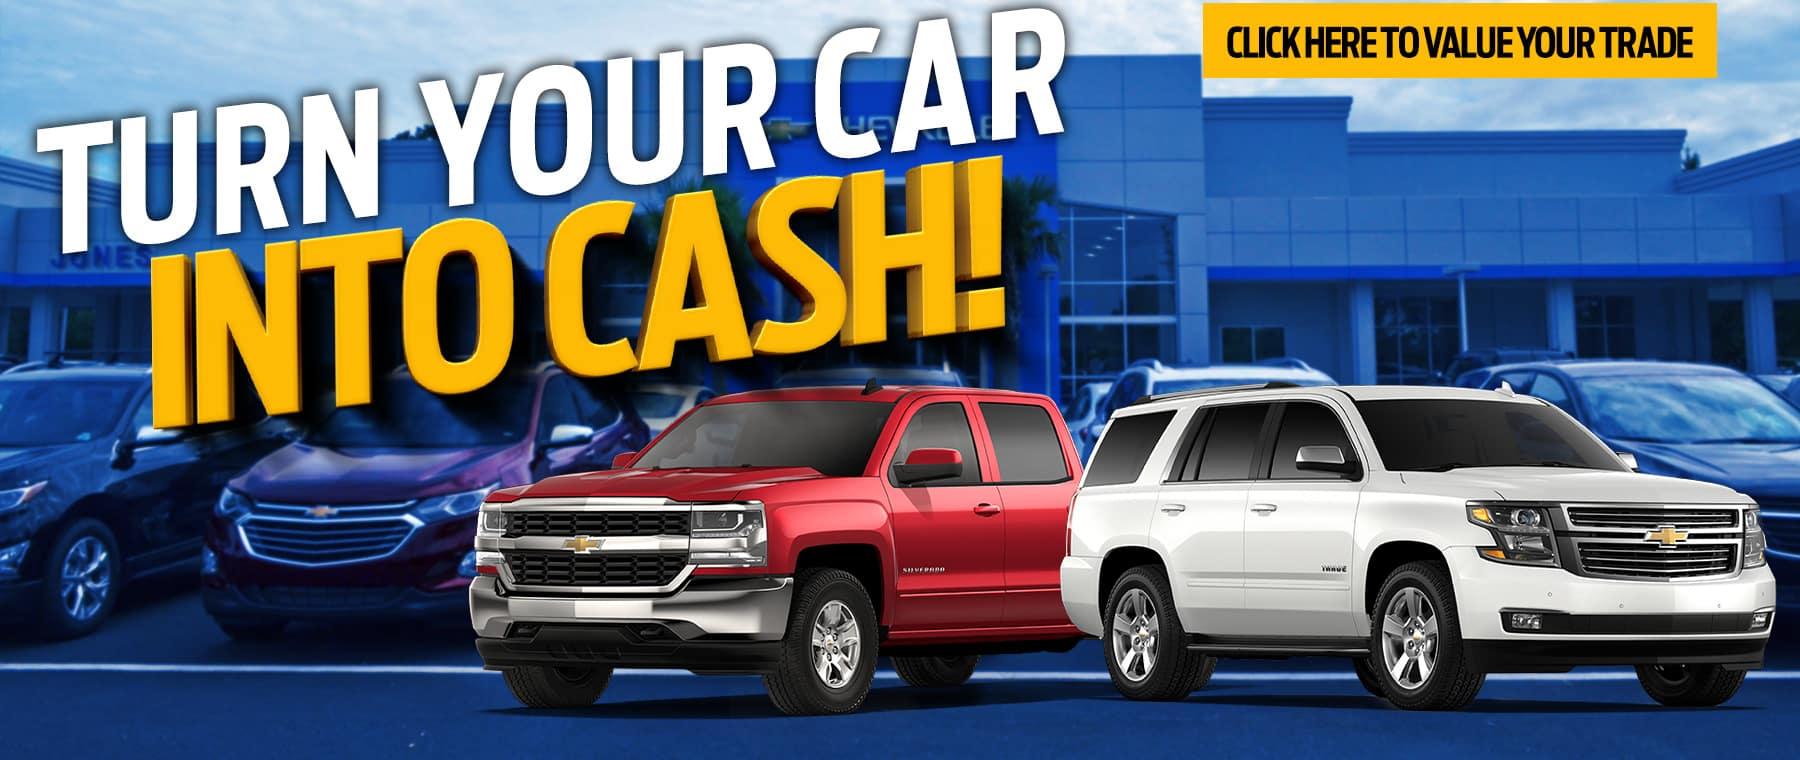 JOCH86426-01-Cars-To-Cash-Slide